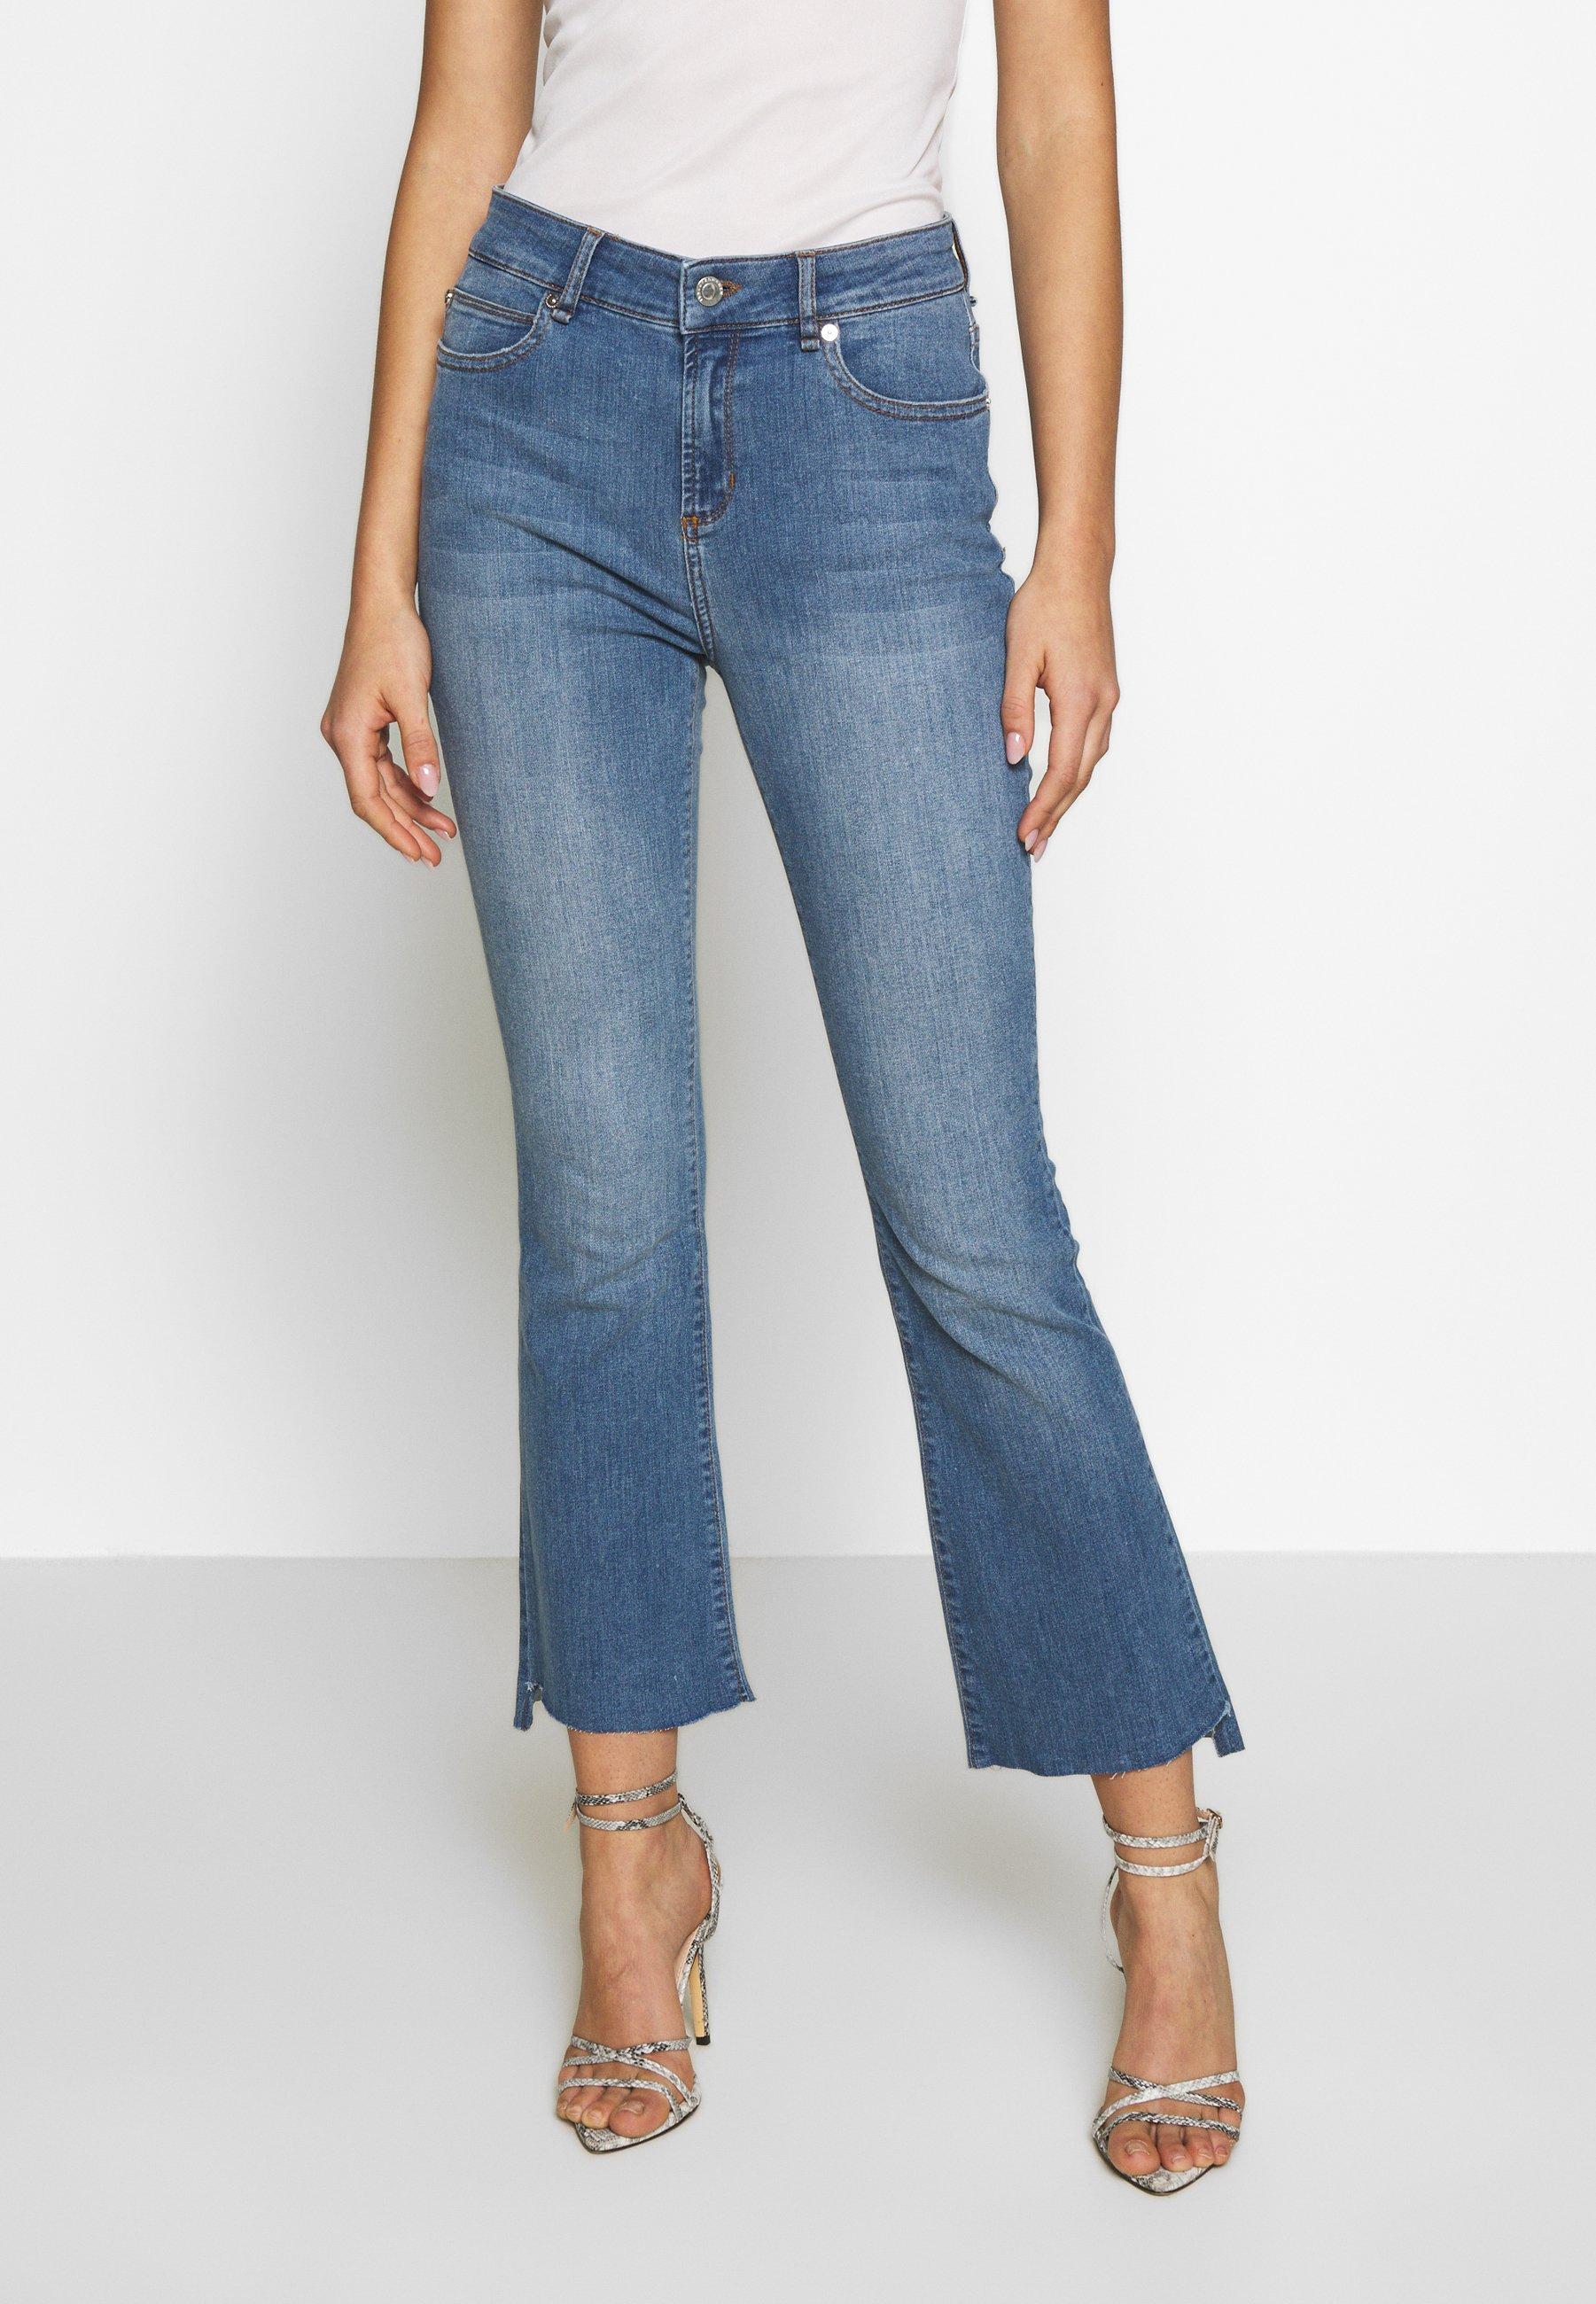 Ivy Copenhagen JOHANNA KICK WASH LINZ - Jean flare - denim blue - Jeans Femme k8ZCp